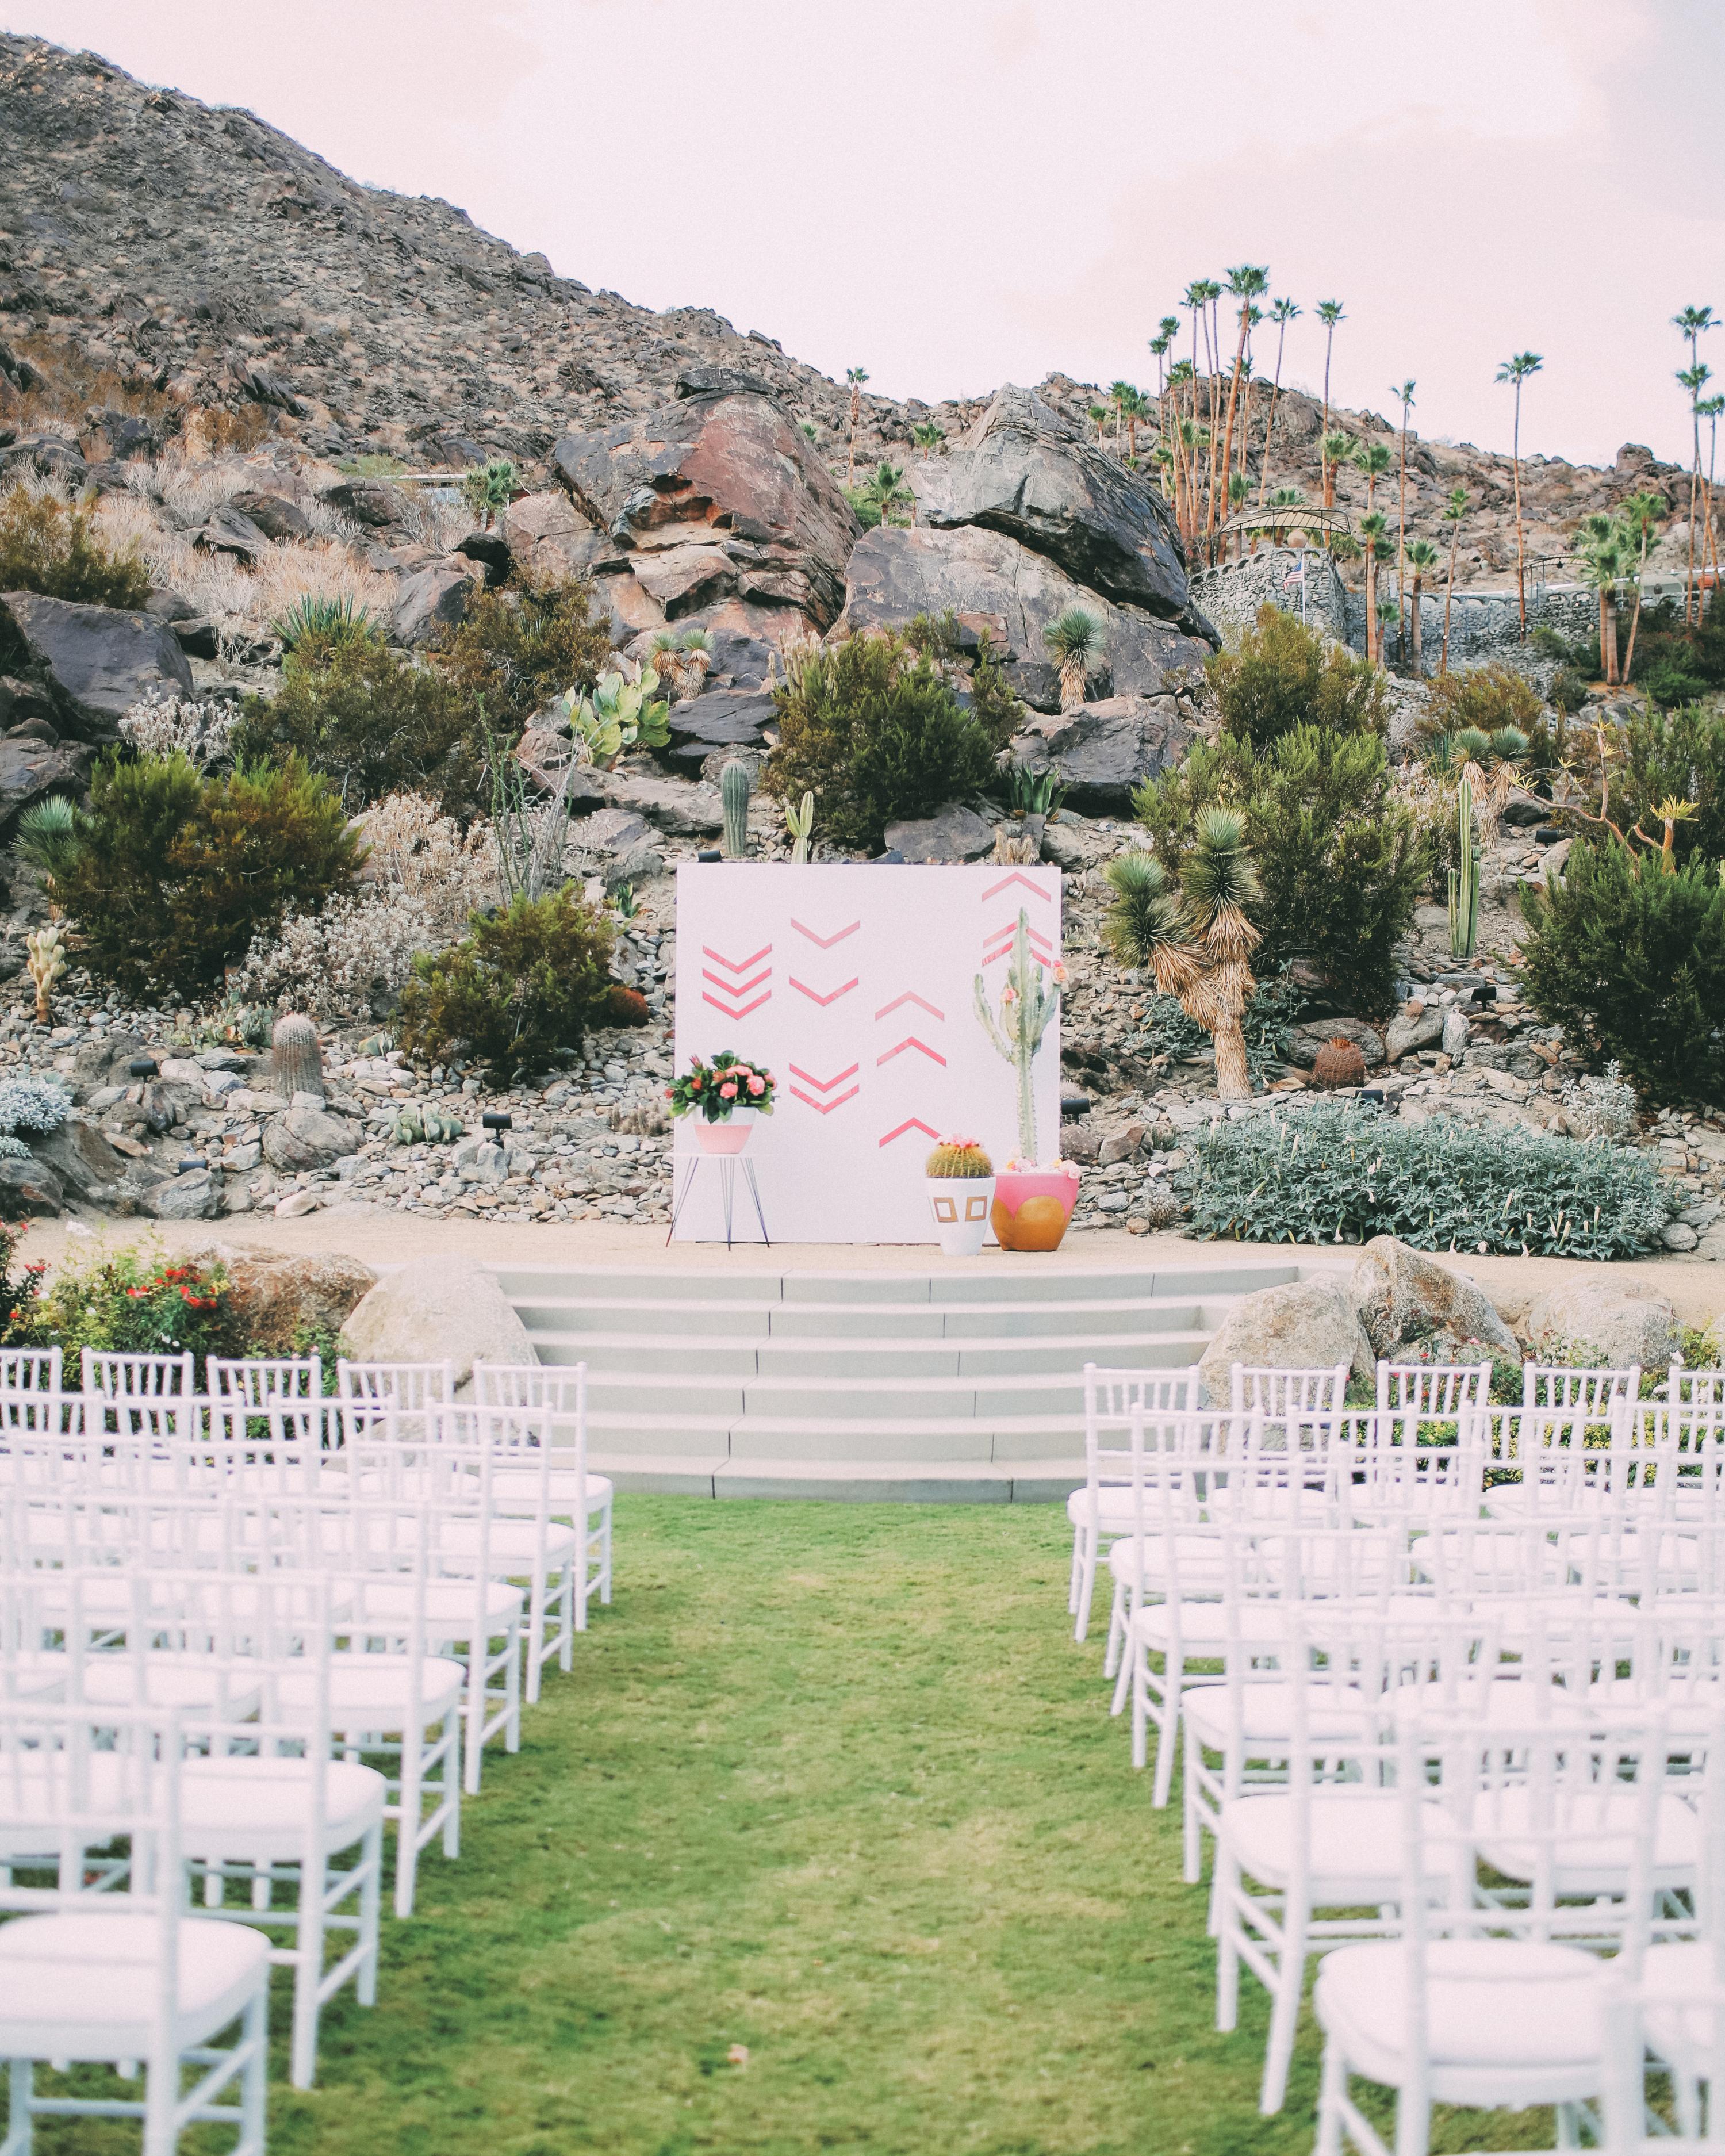 katie-brian-wedding-ceremony-3408-s111885-0515.jpg